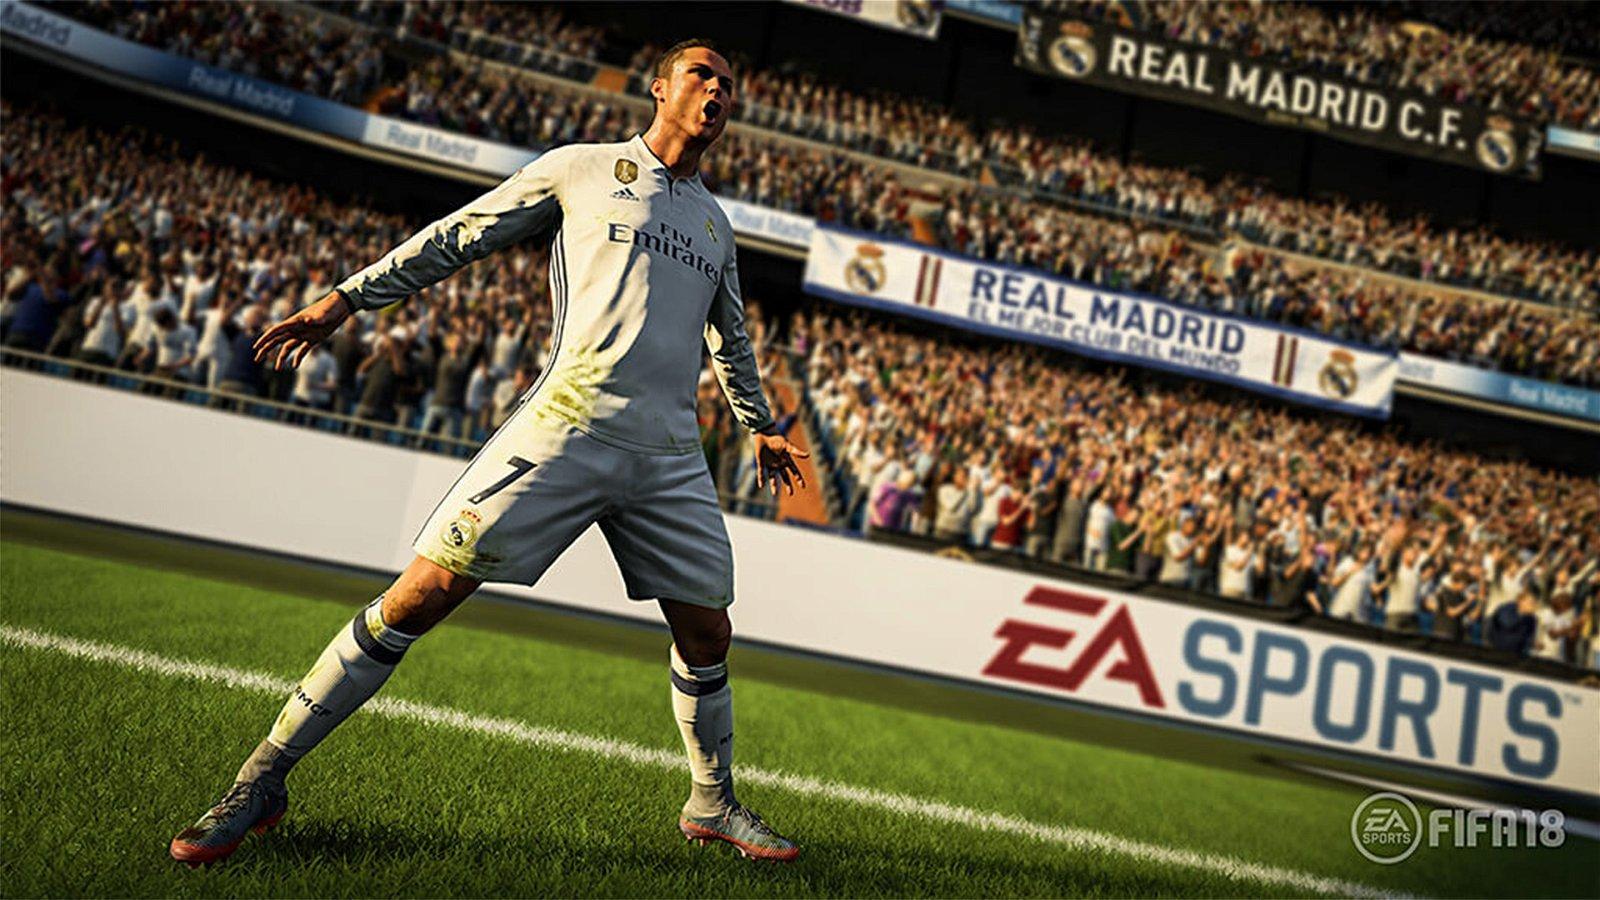 Strong Digital Sales and FIFA 18 Highlight EA Q3 Report